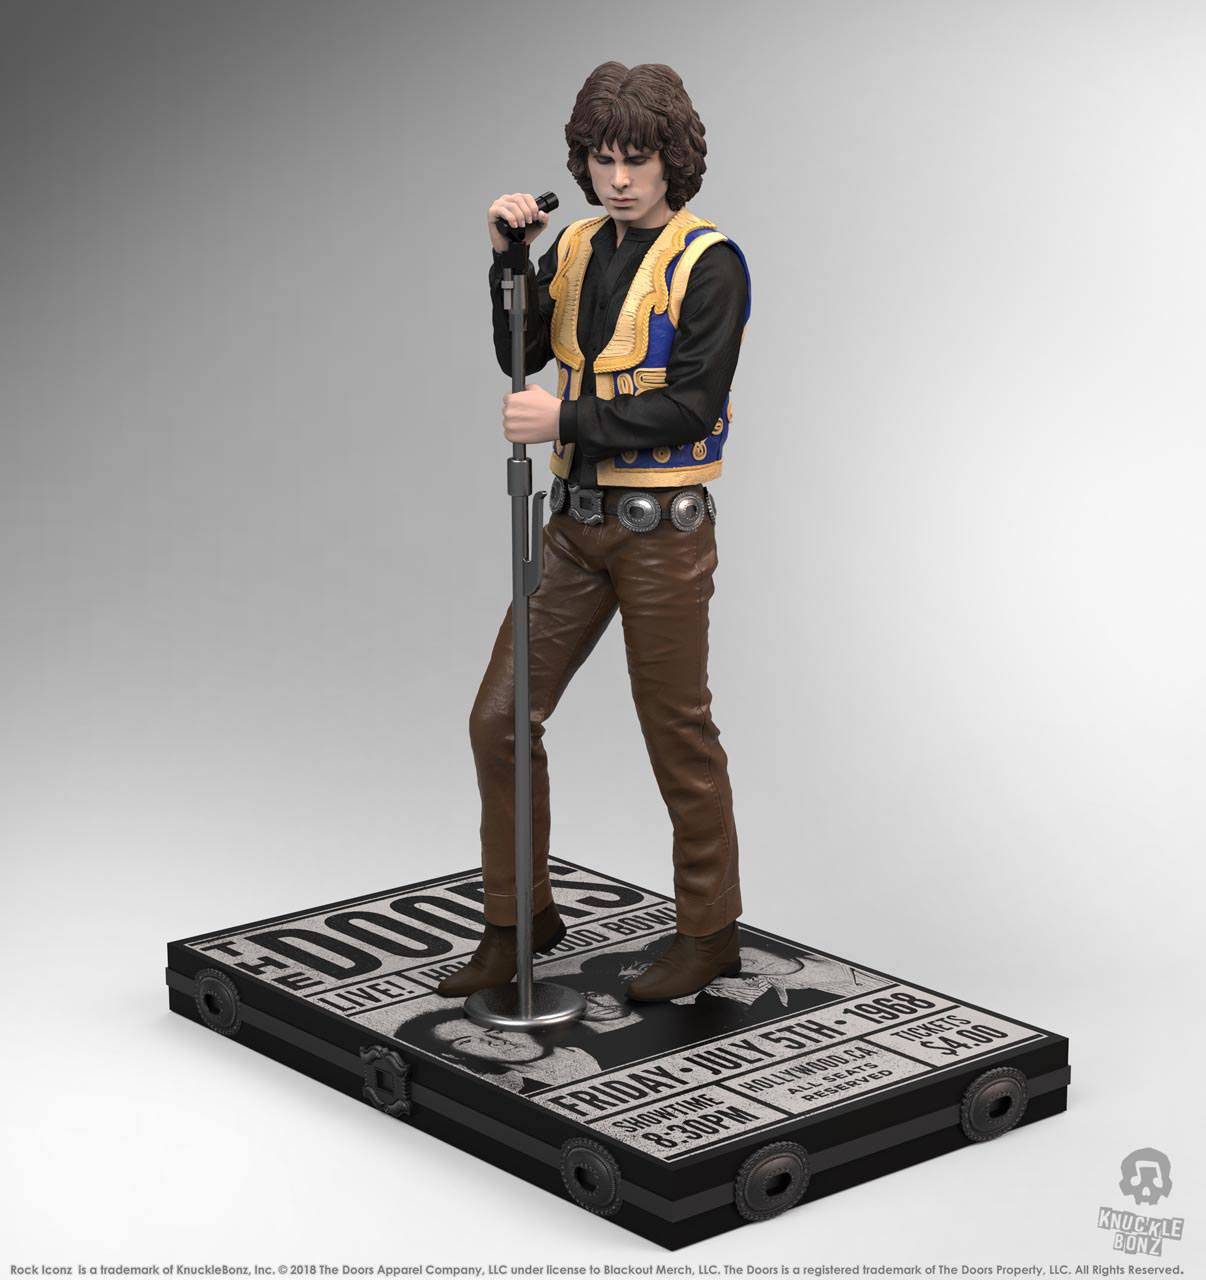 Jim Morrison The Doors Rock Iconz 1/9 Statue by Knucklebonz